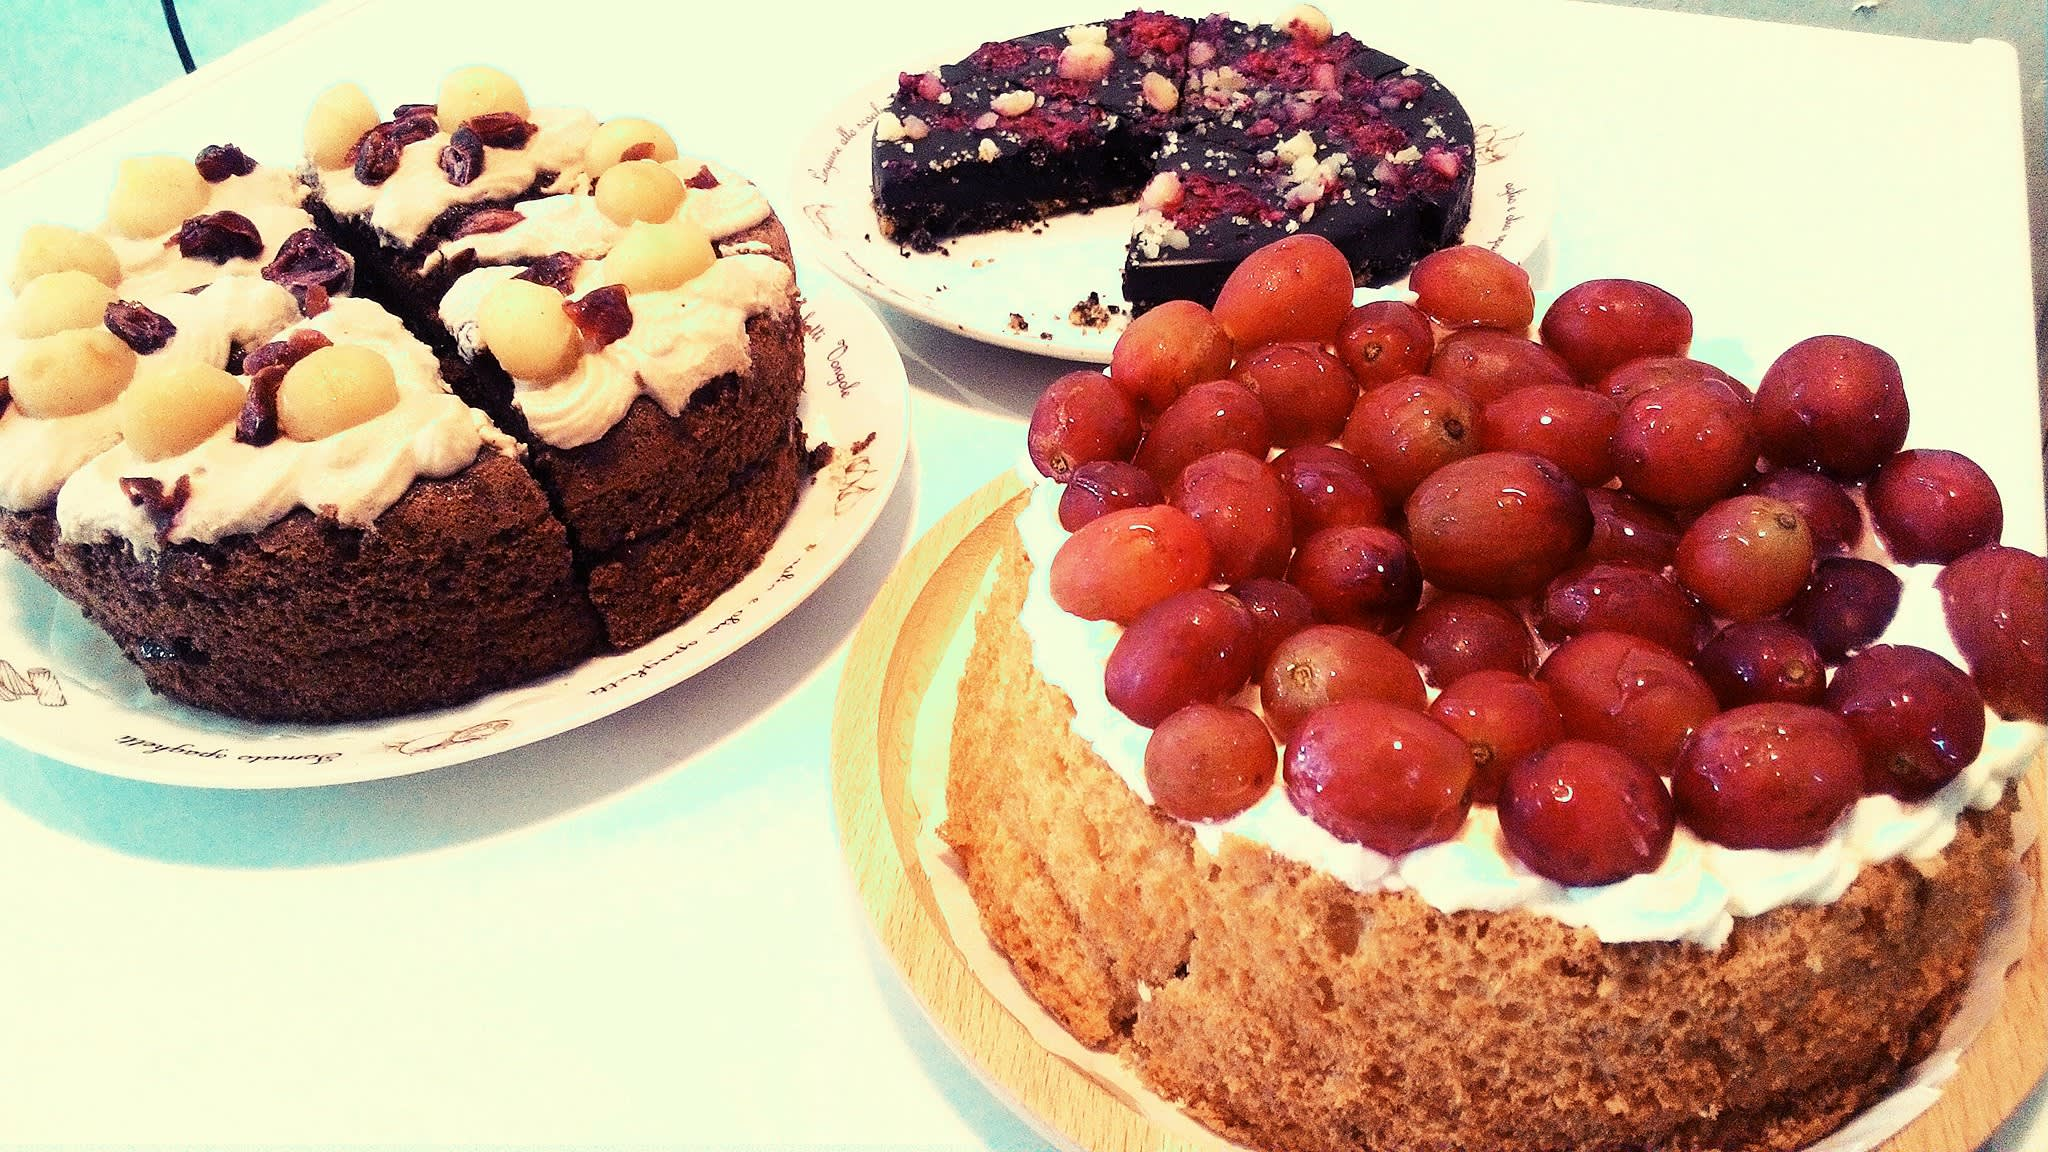 每 日 手 工 蛋 糕 。PHOTO | SideWalk Espressobar